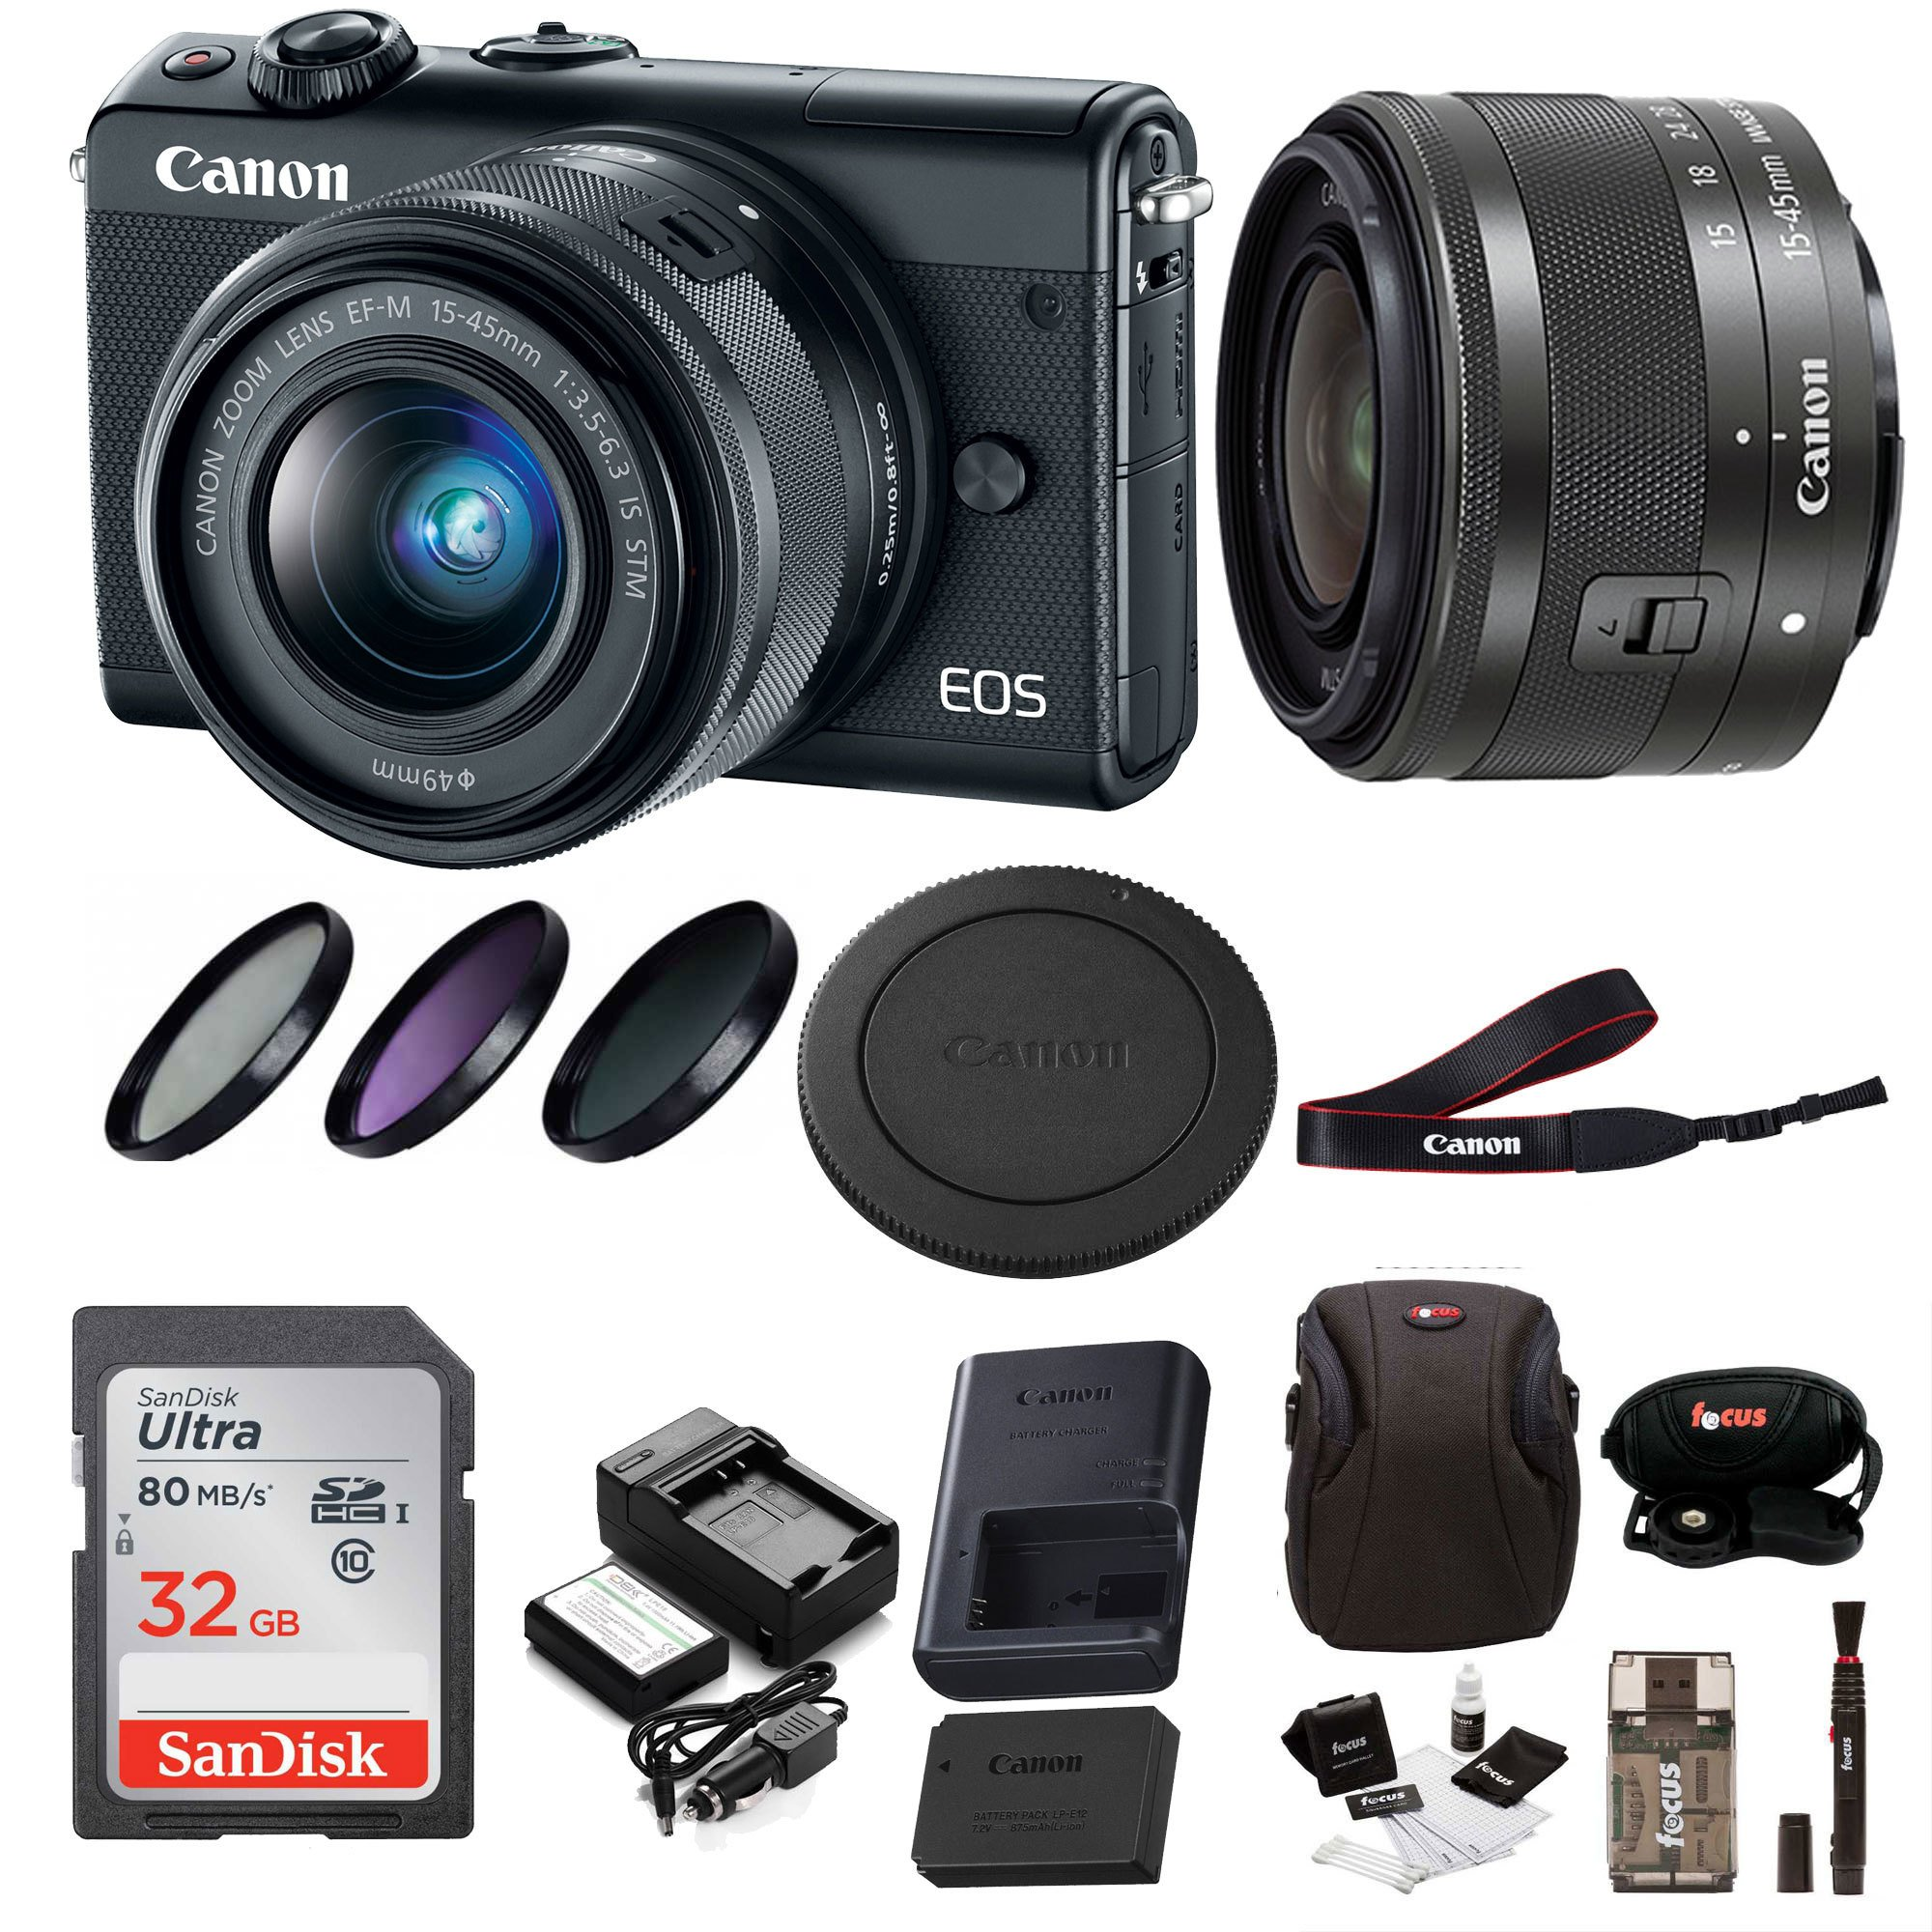 Canon EOS M100 Mirrorless Digital Camera EF-M 15-45mm lens (Black) + 32GB Memory Card + Filter Kit + Bundle